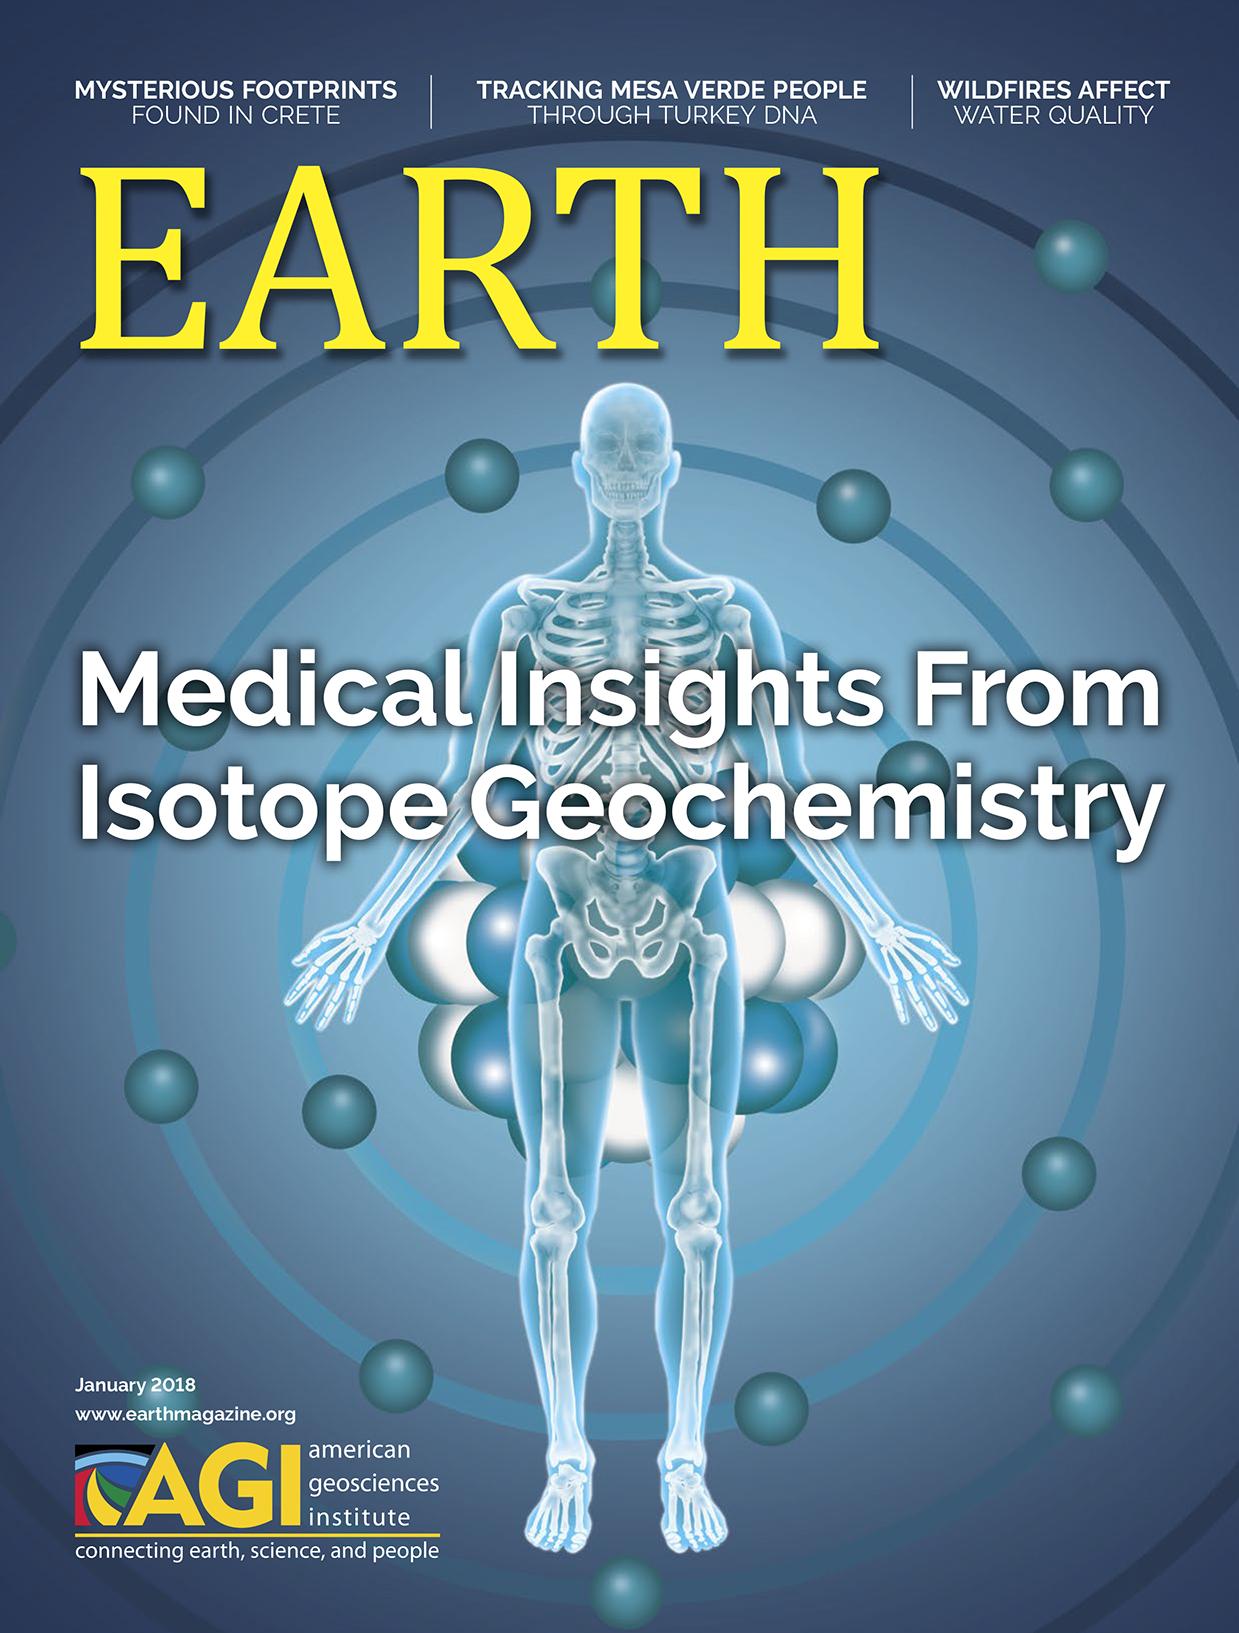 January 2018  EARTH Magazine,layout by Nicole Schmidgall  www.nicoleschmidgall.com